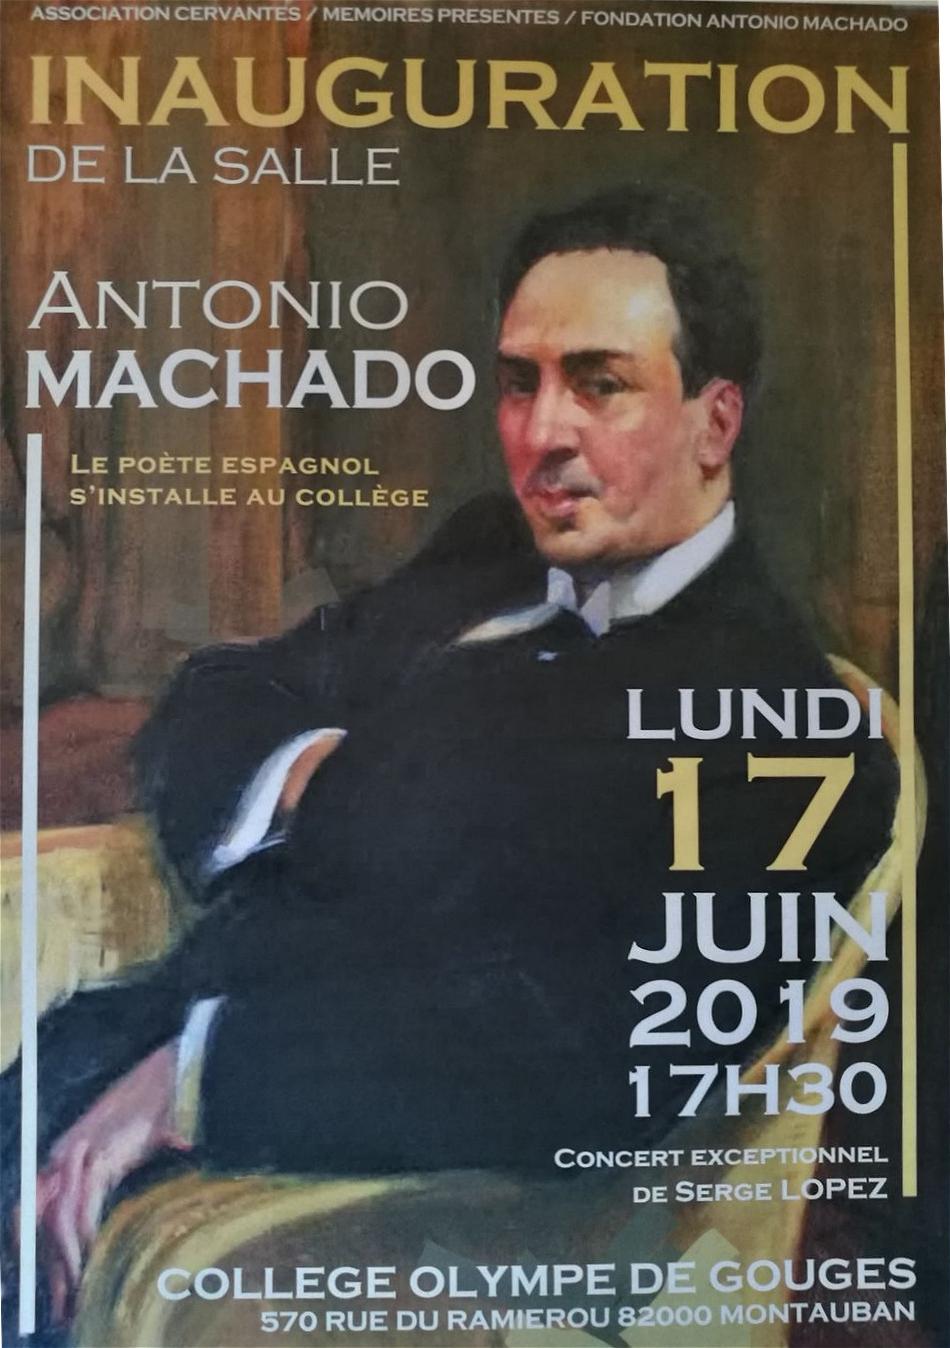 Inauguration Salle Antonio Machado du Collège Olympe de Gouges de Montauban